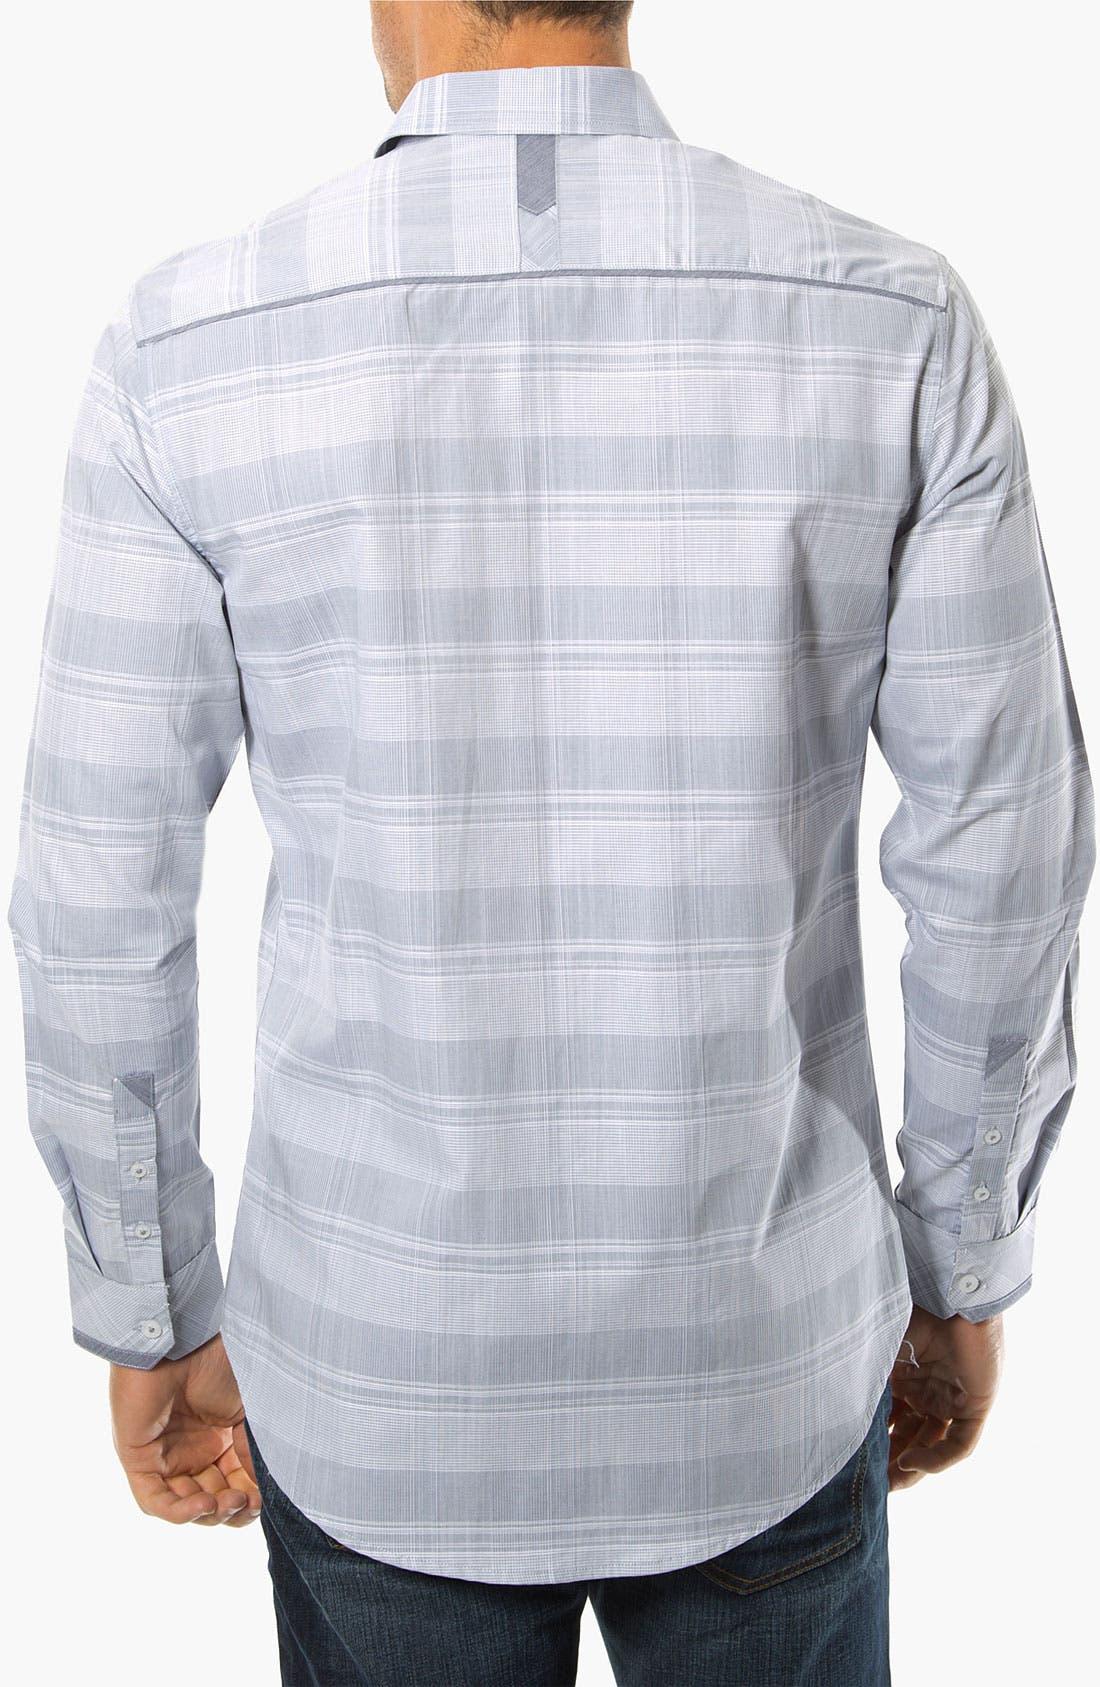 Alternate Image 2  - 7 Diamonds 'Sticks and Stones' Woven Shirt